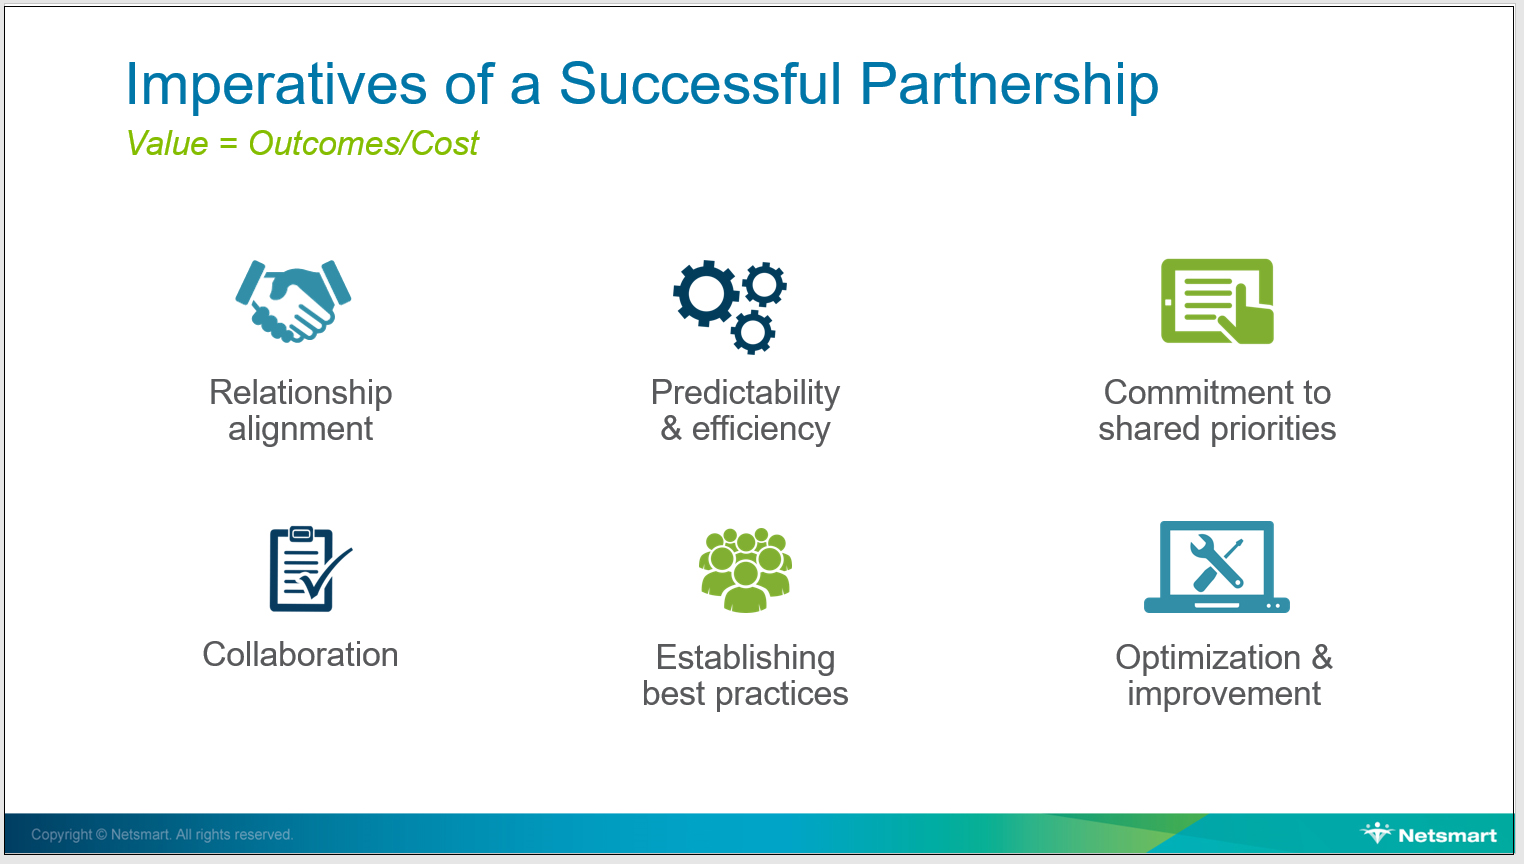 Netsmart Partnership